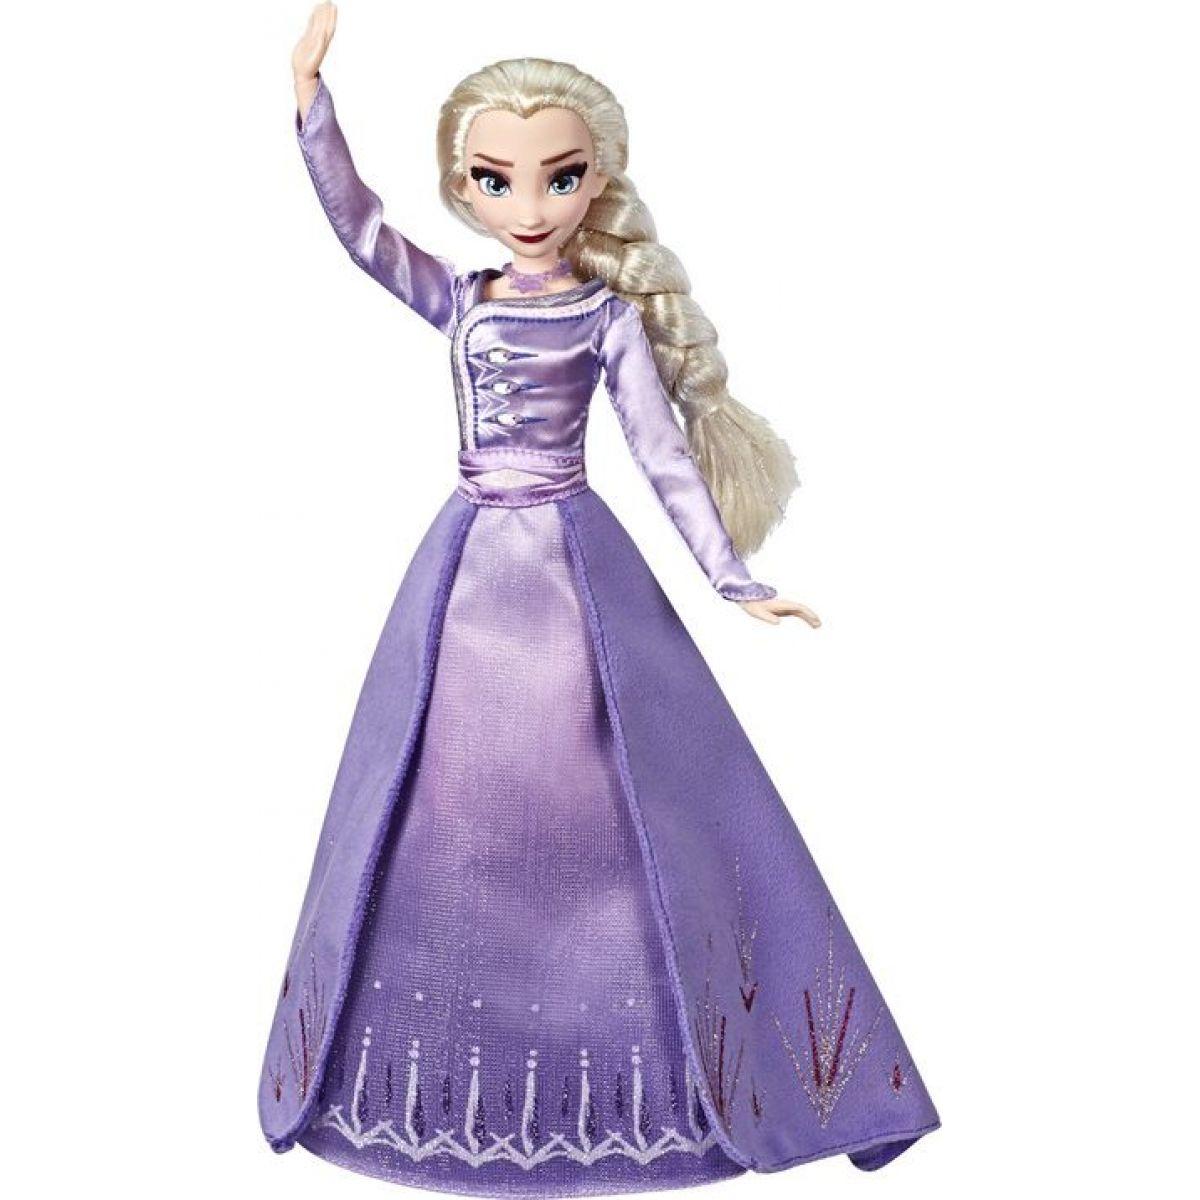 Hasbro Frozen 2 Panenka Elsa Deluxe